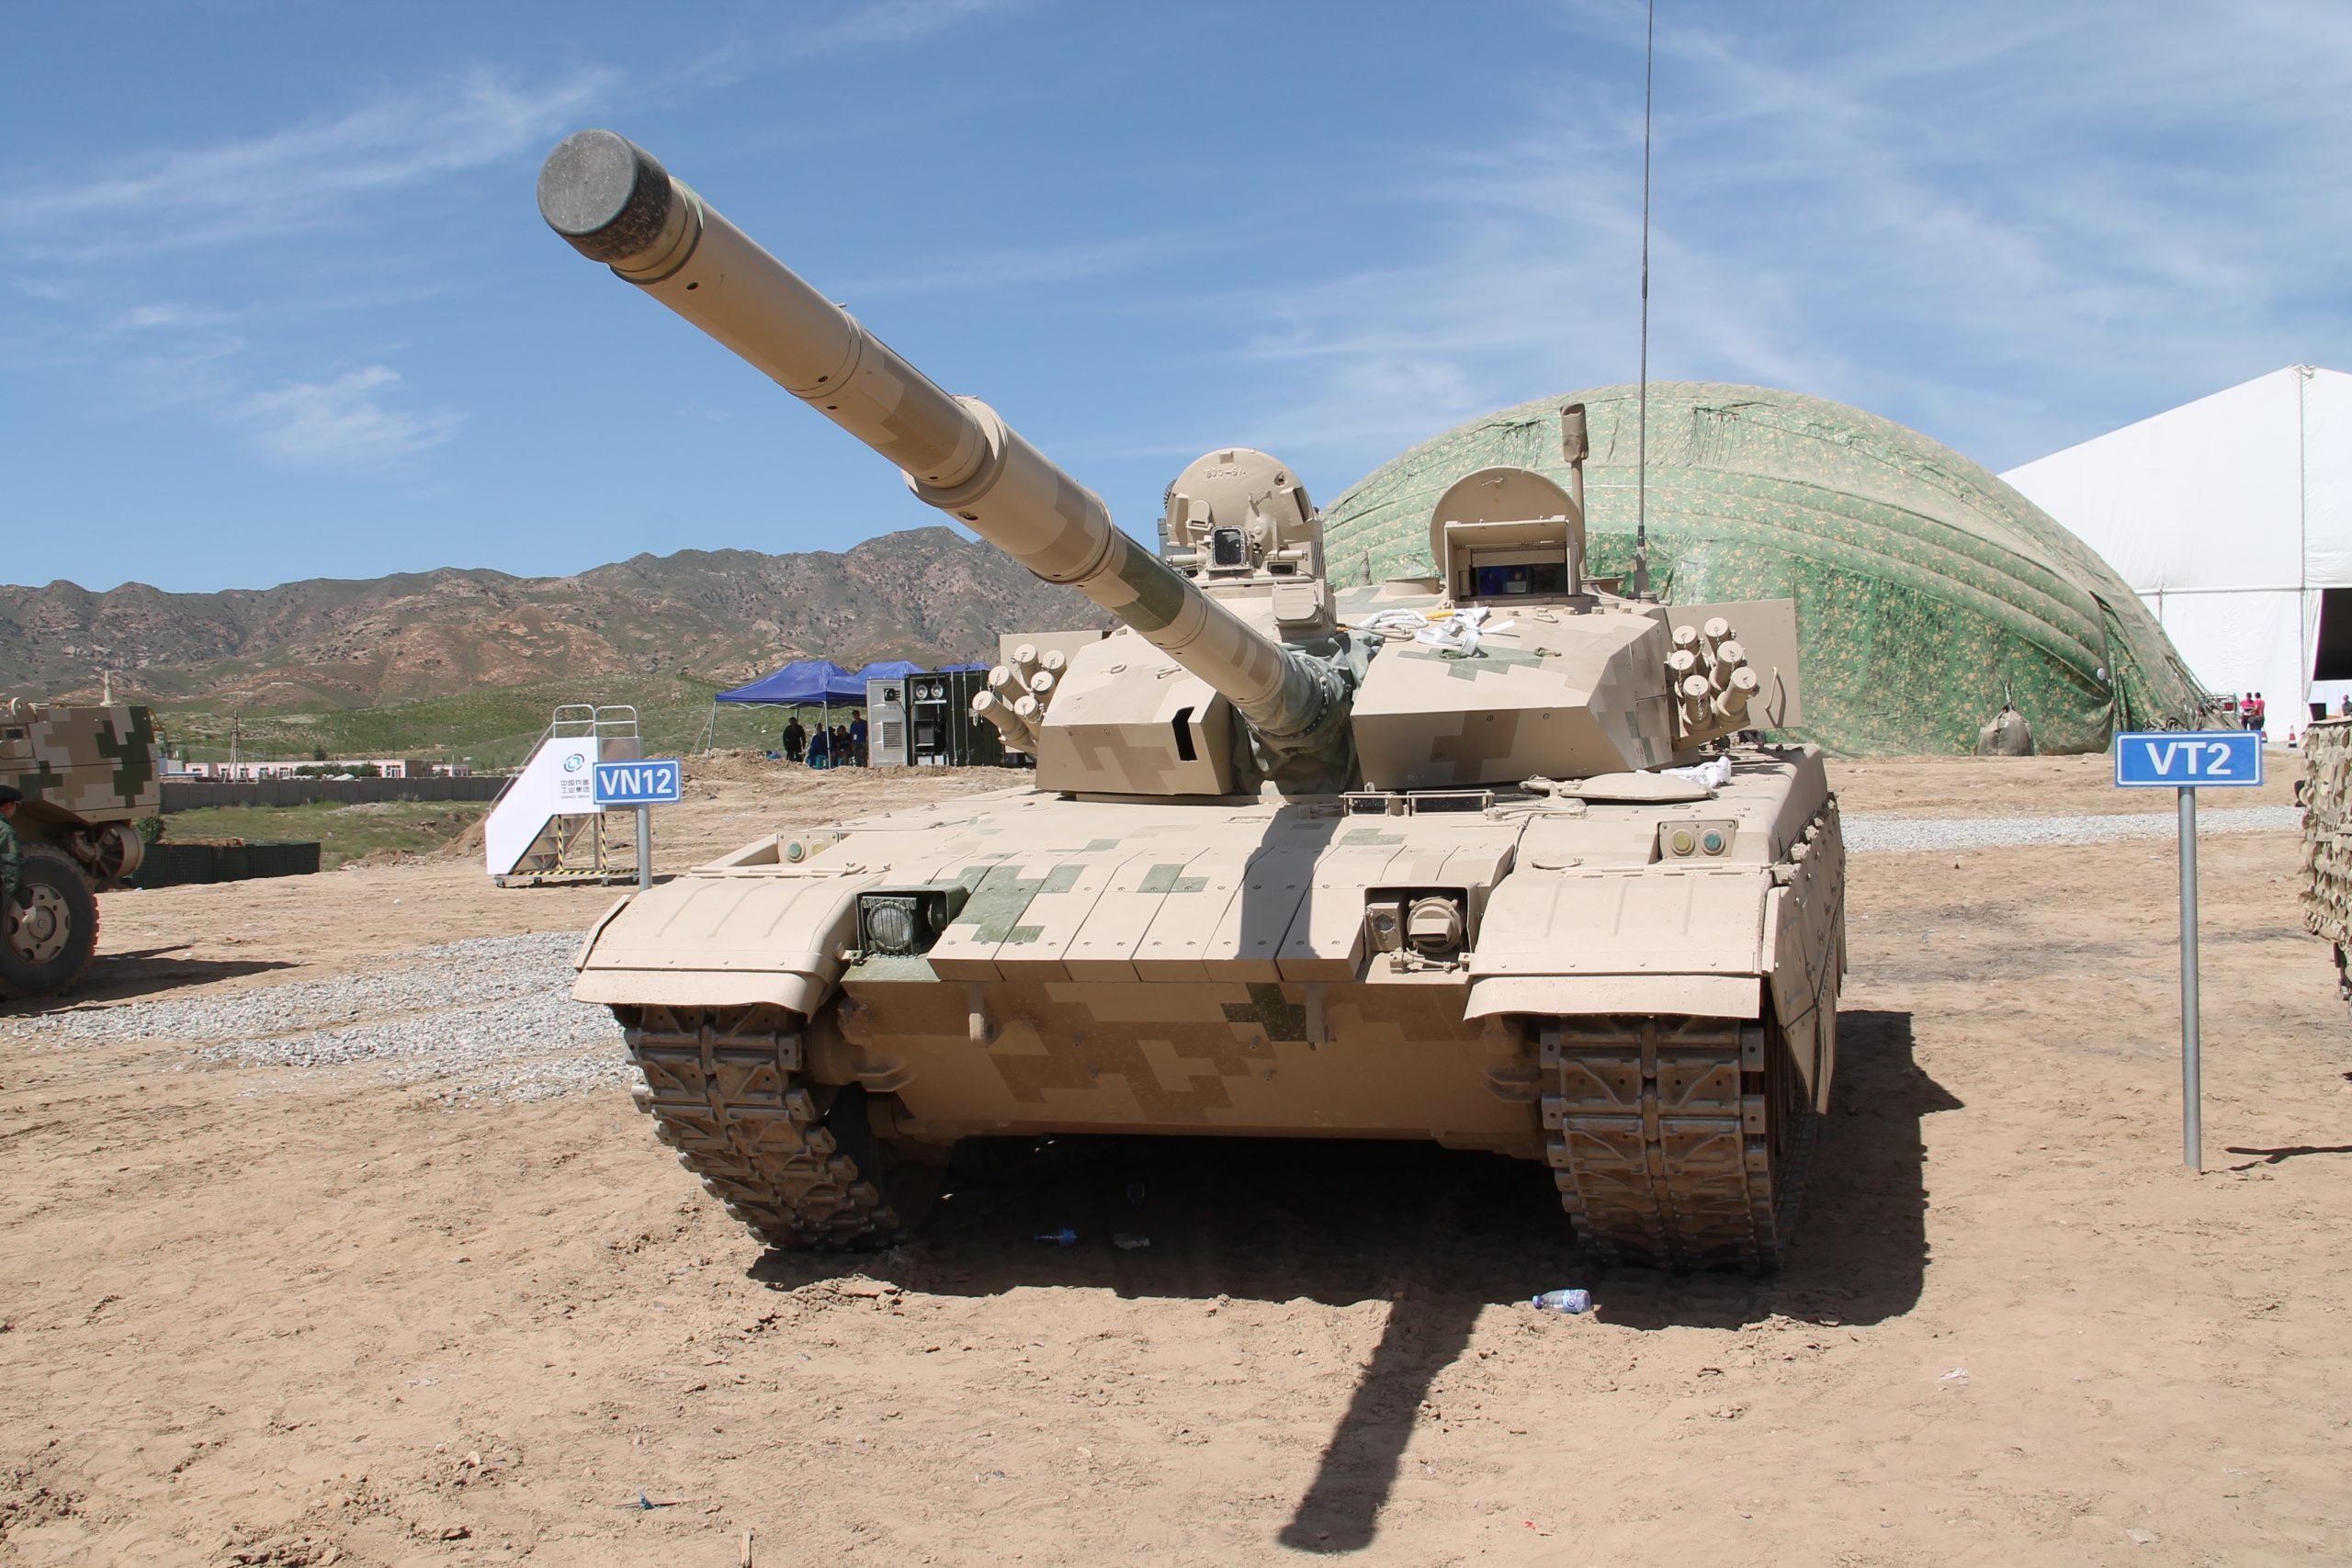 Norinco VT2 MBT